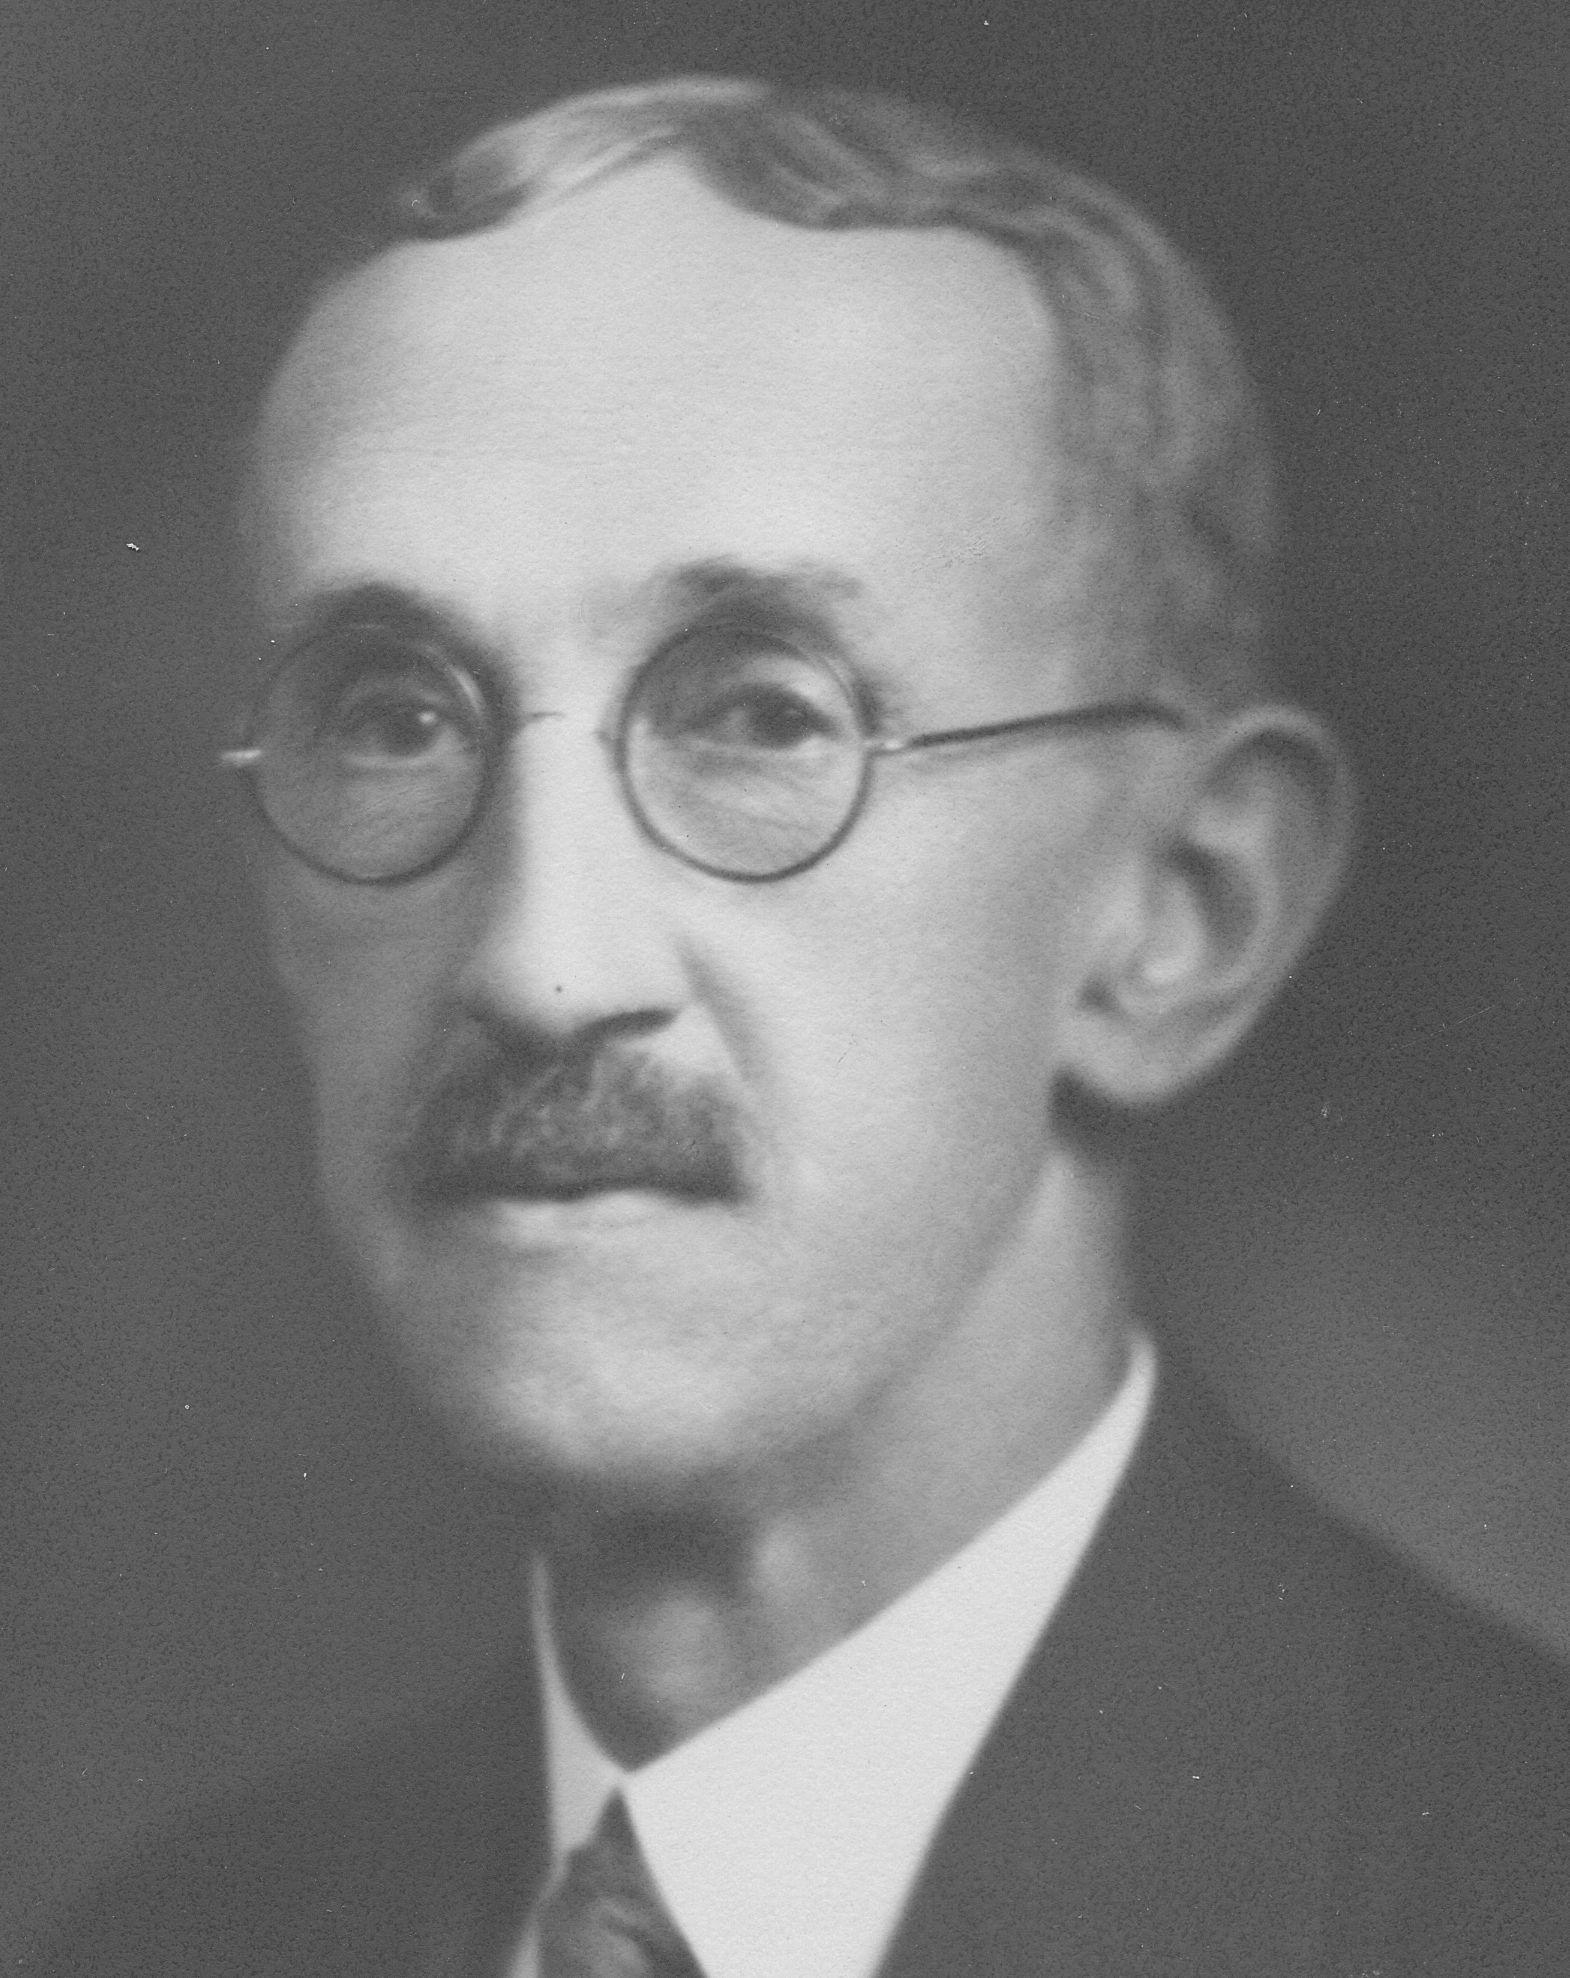 White, Herbert Addison